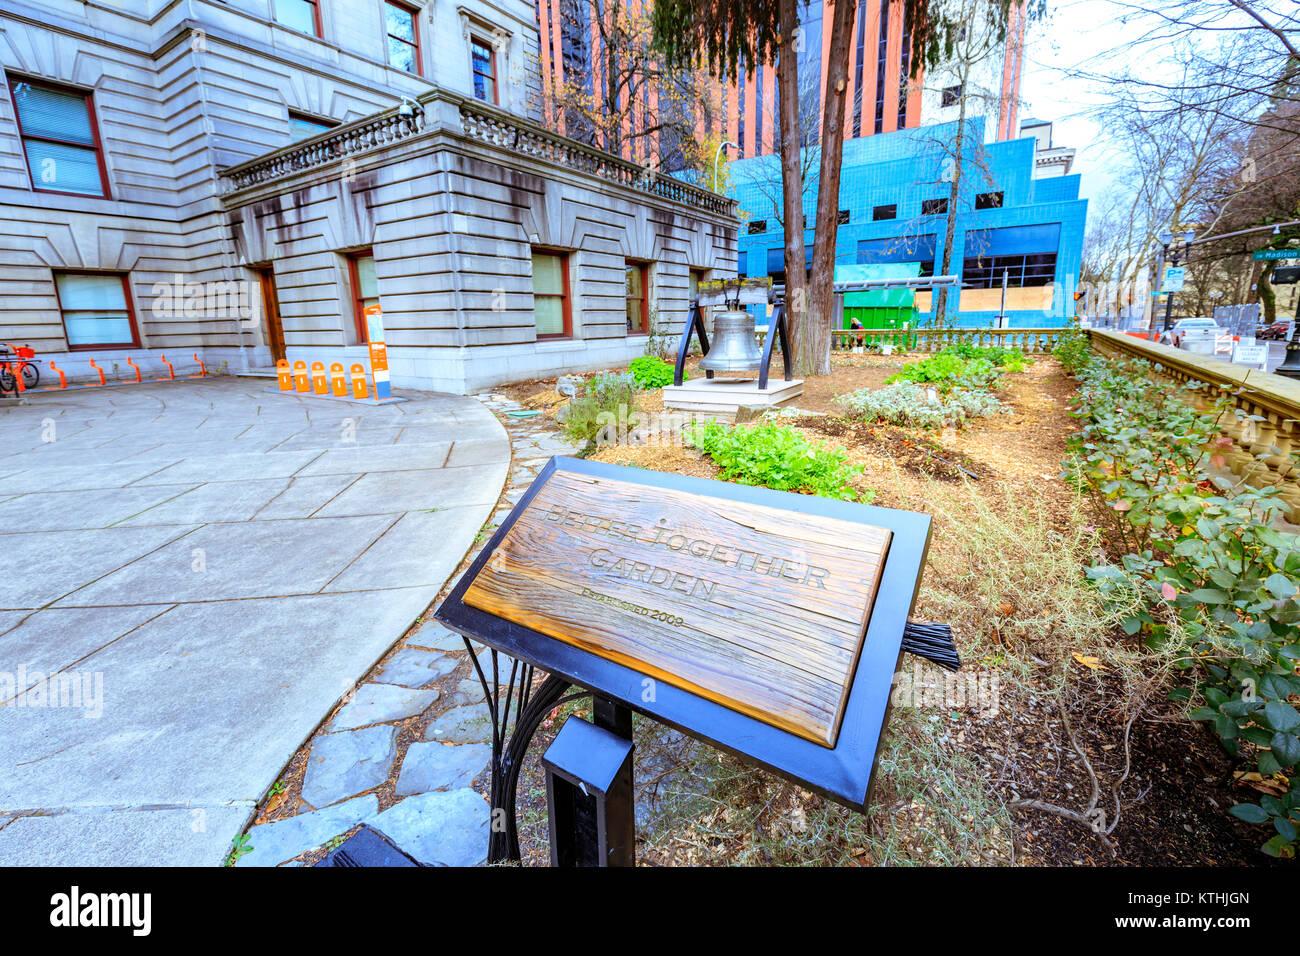 Portland, Oregon, United States - Dec 19, 2017 : Garden sign at Portland city hall Stock Photo